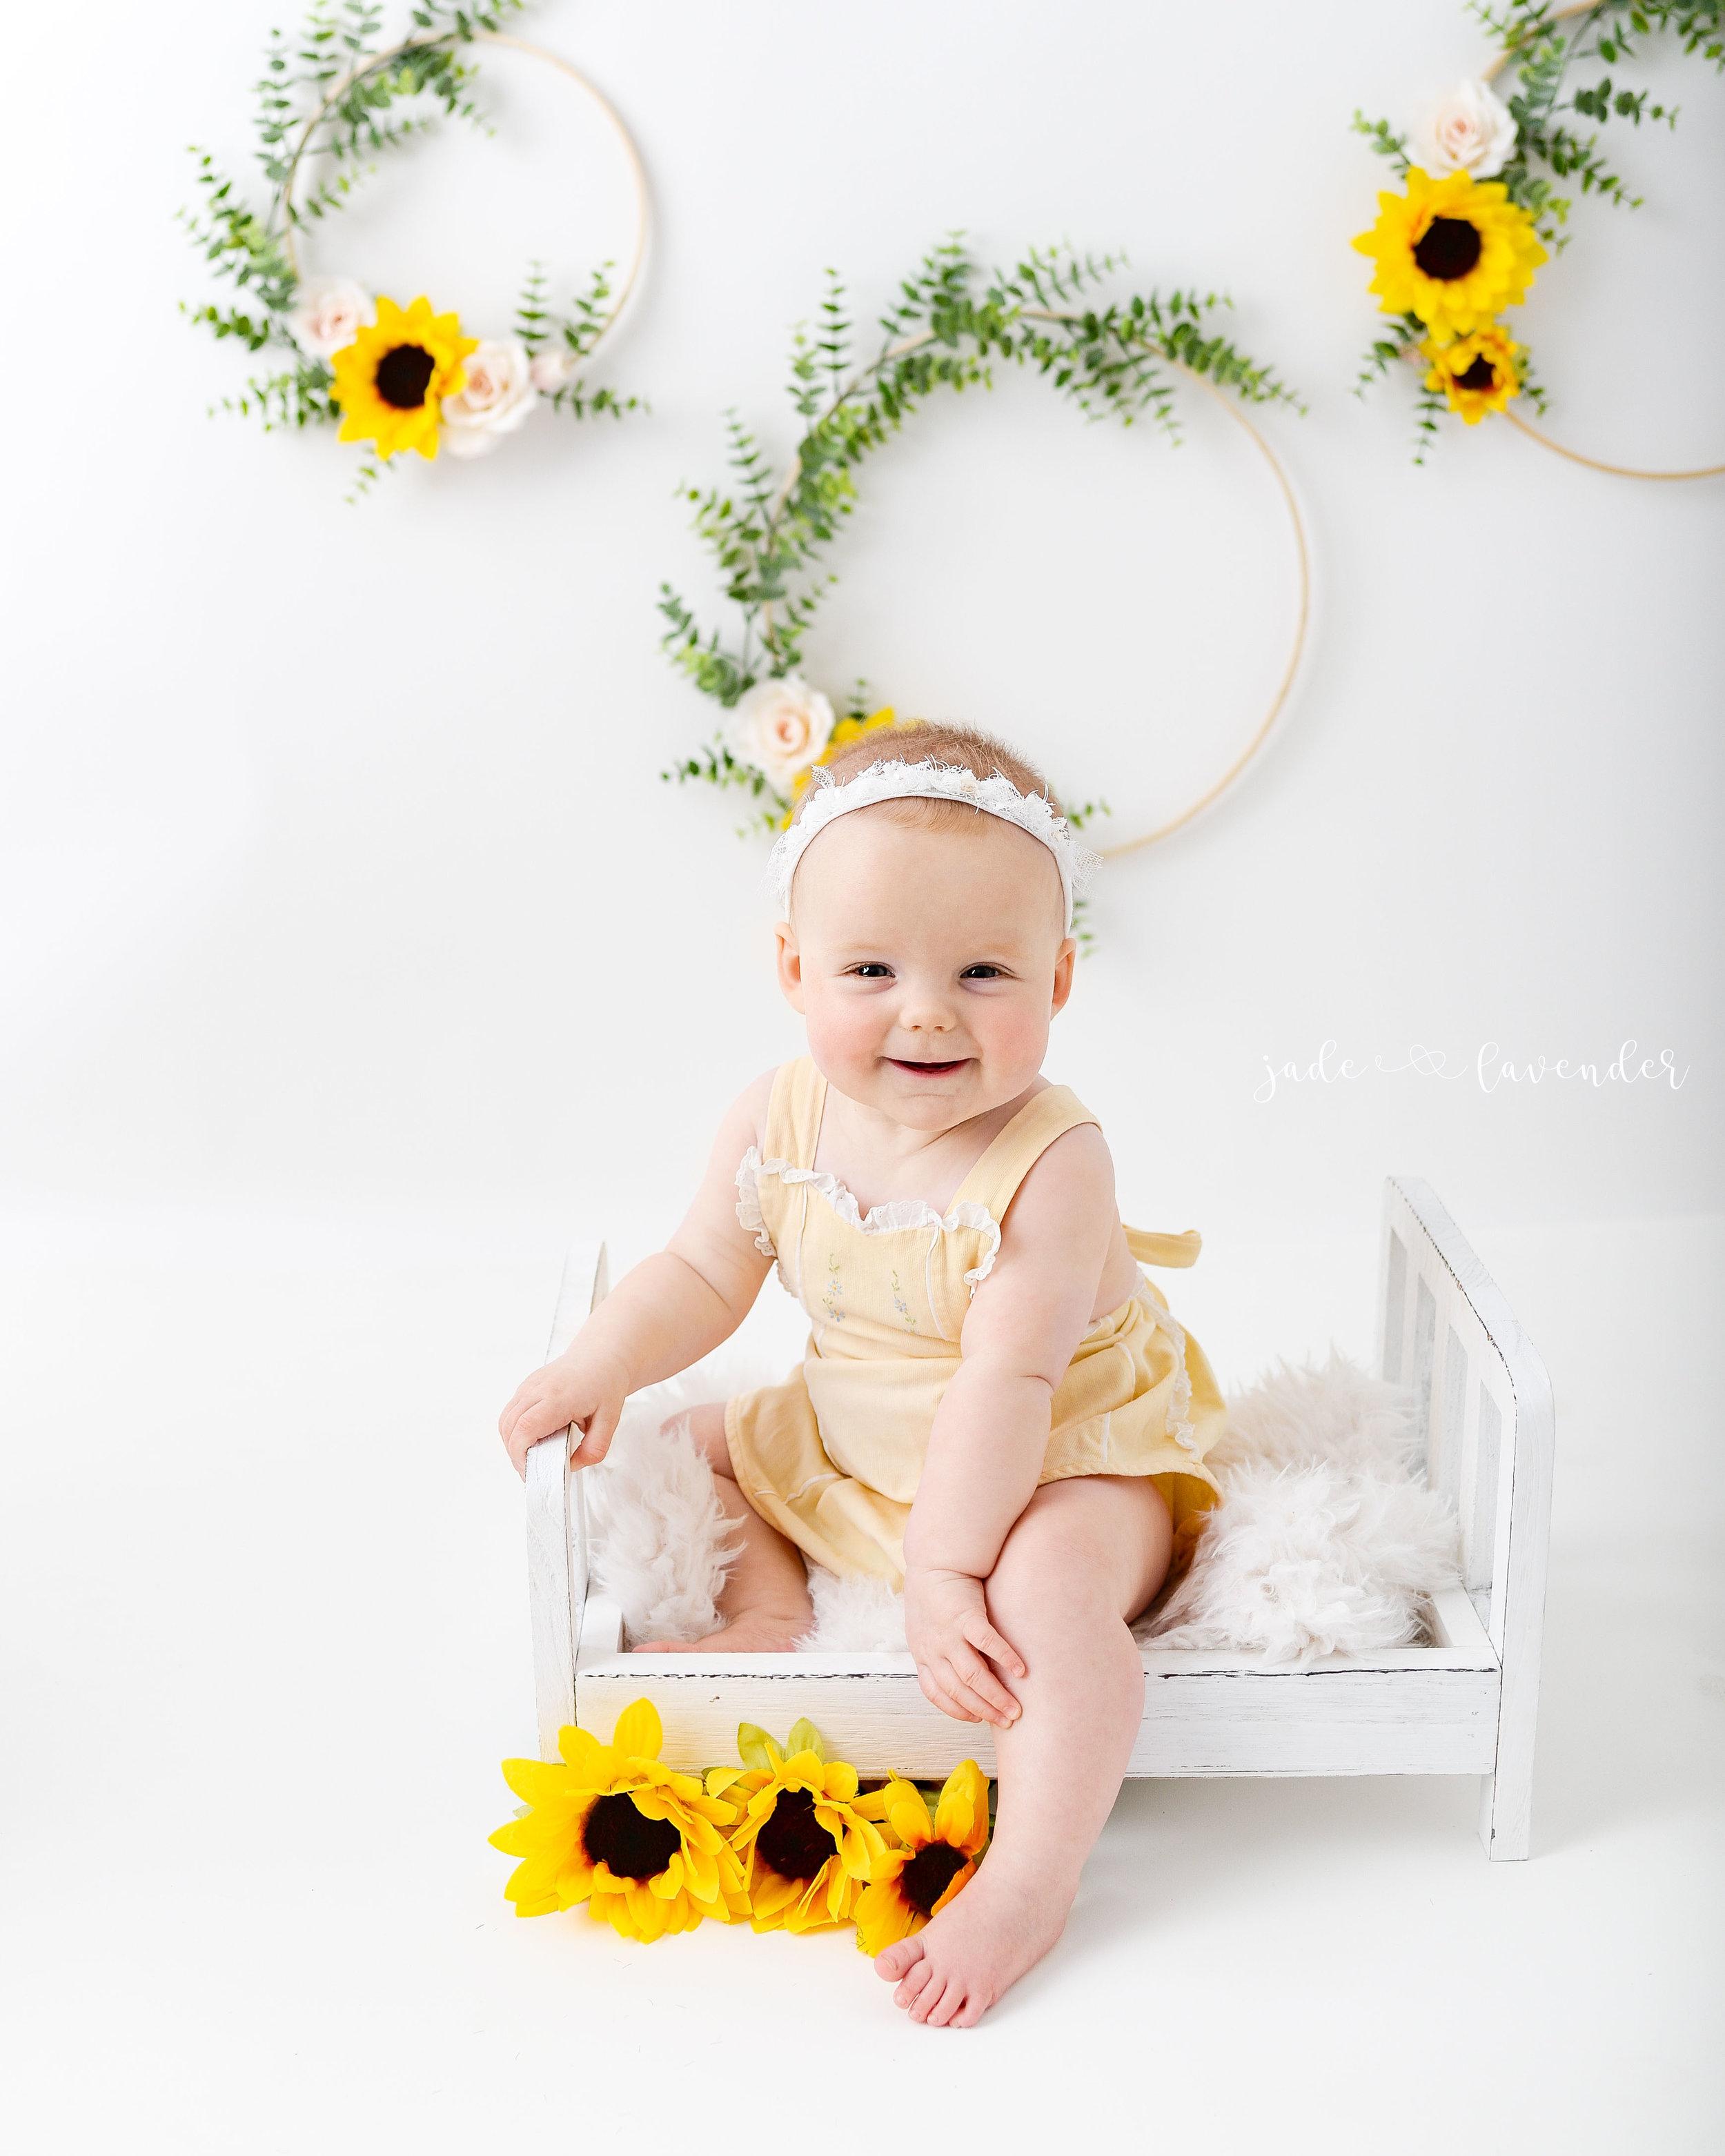 Baby-girl-milestone-milkbath-six-month-newborn-photography-infant-images-baby-photos-photographer-spokane-washington (1 of 5).jpg